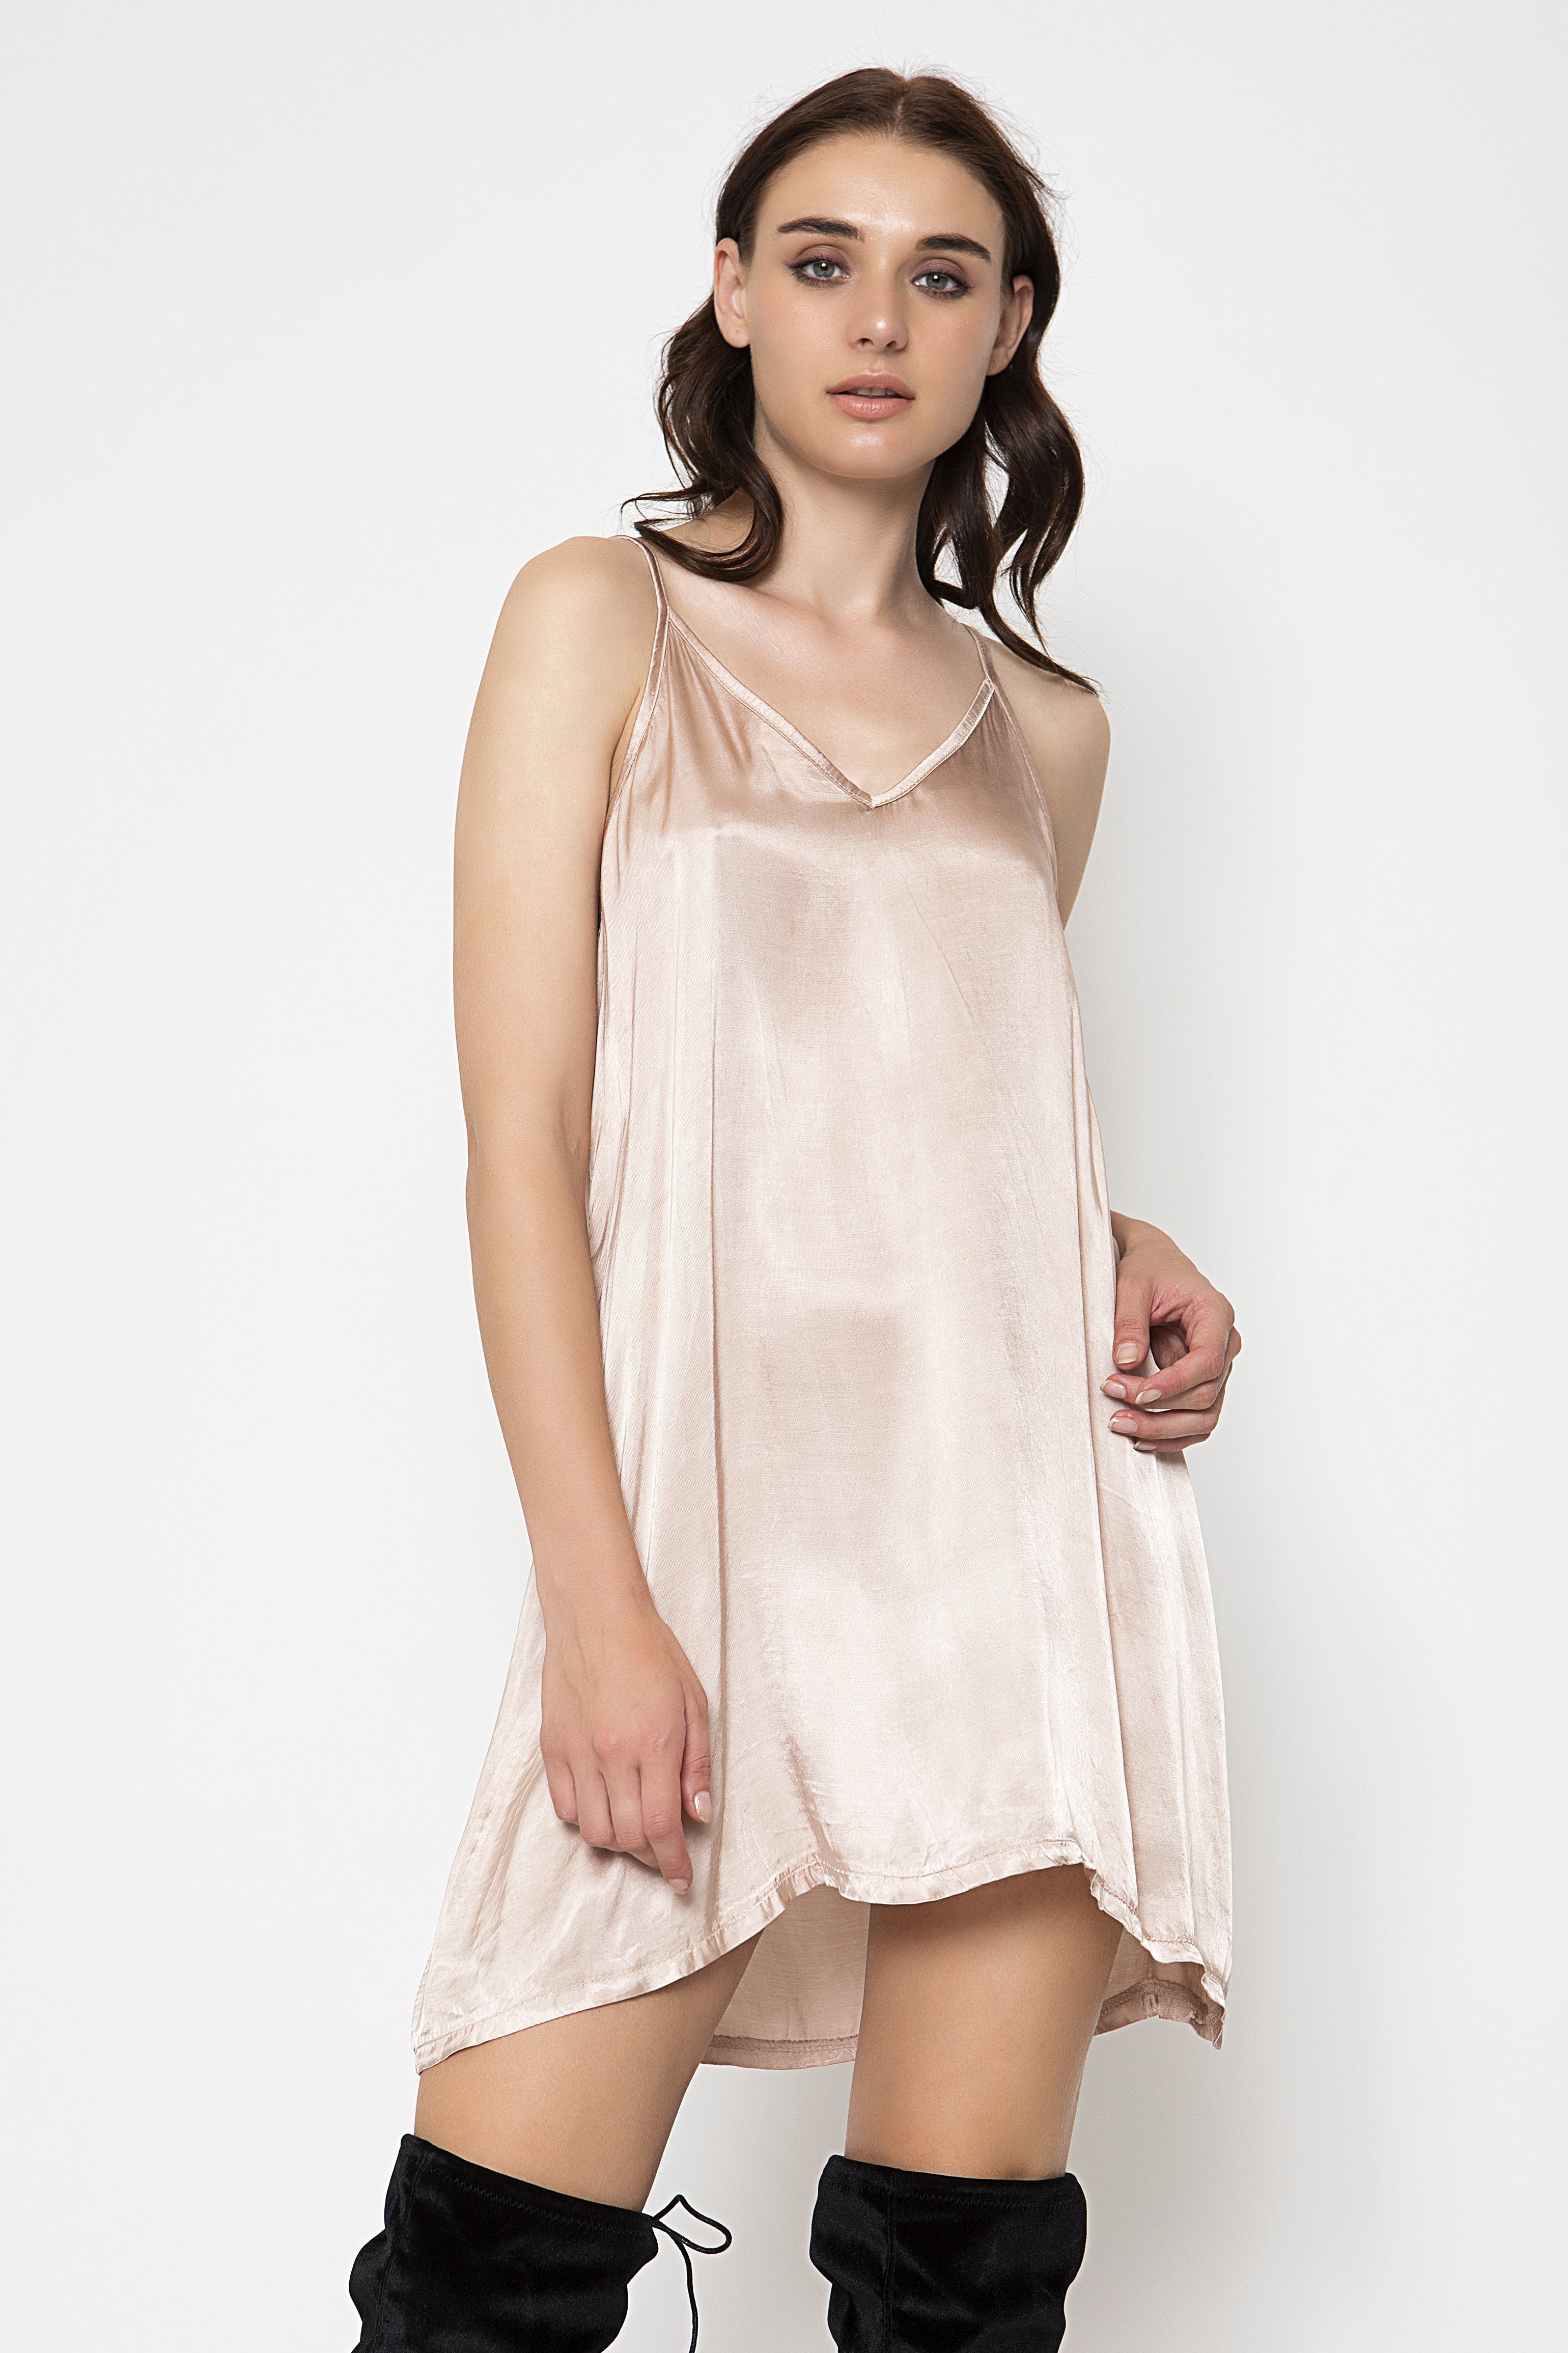 SATIN SLIP ΦΟΡΕΜΑ - Nude clothes   φορέματα   φόρμες   mini φορέματα